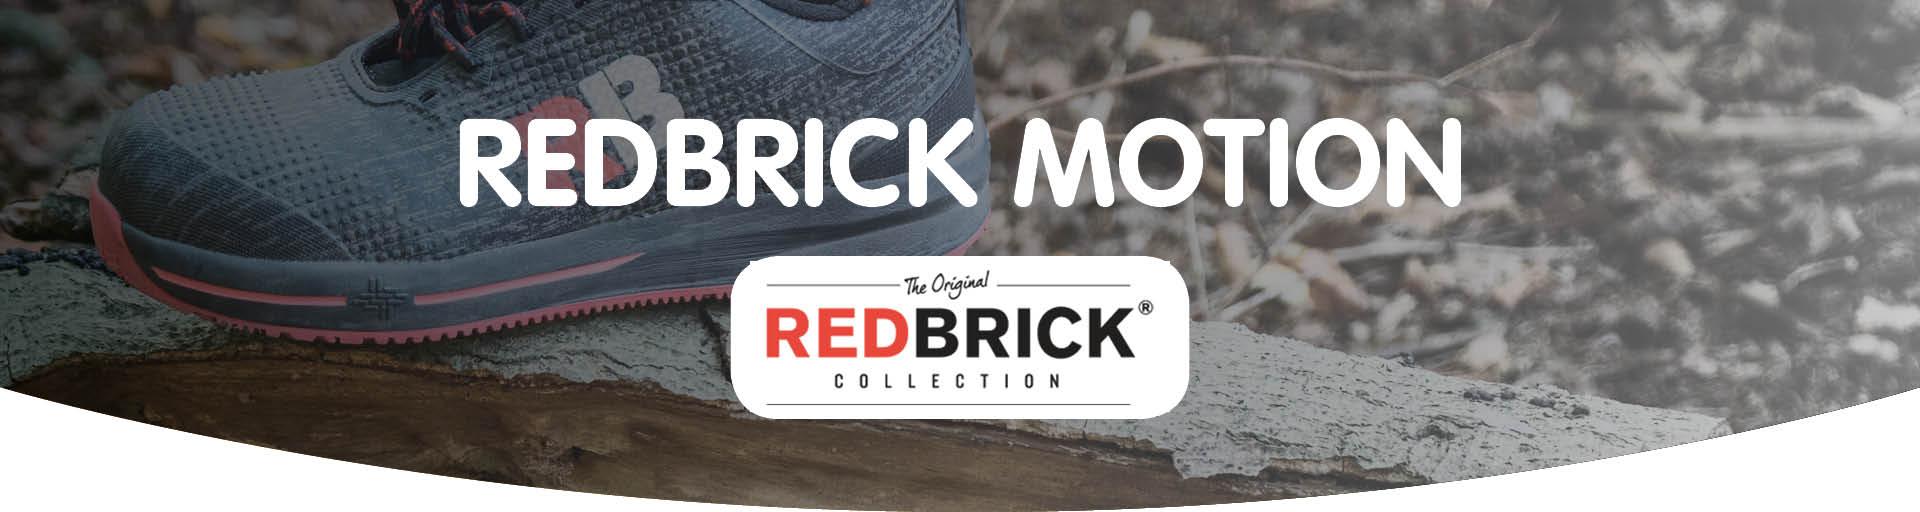 Redbrick Motion